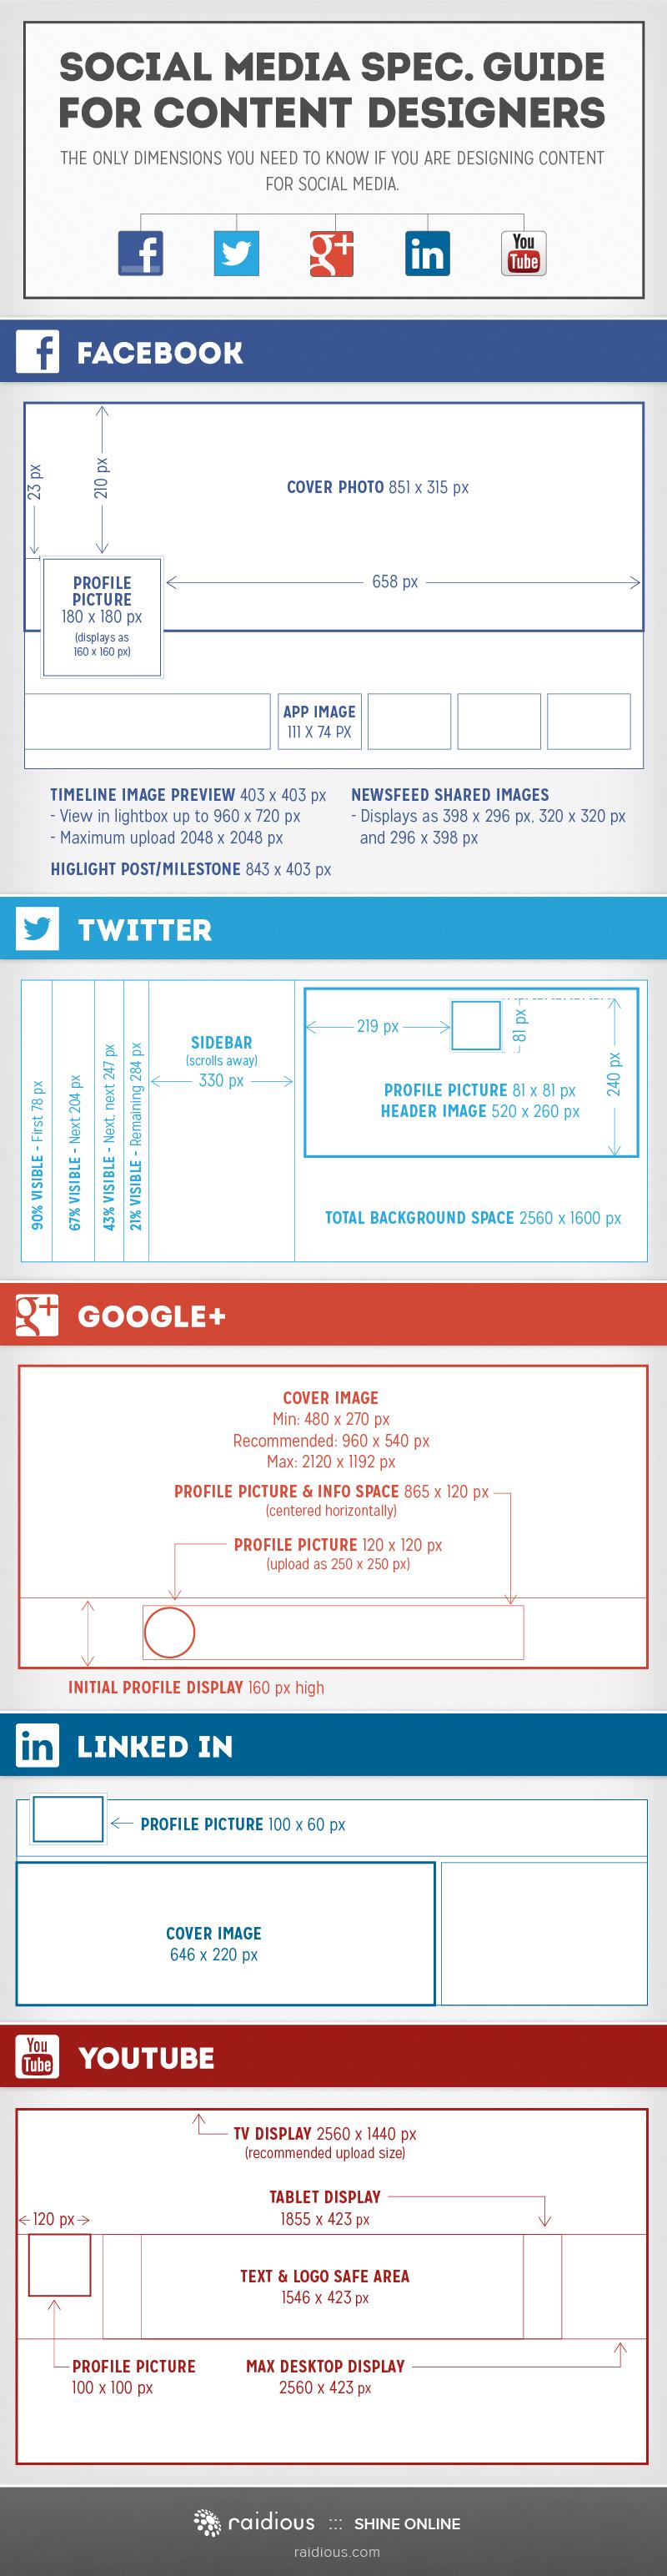 social-media-spec-guide.png